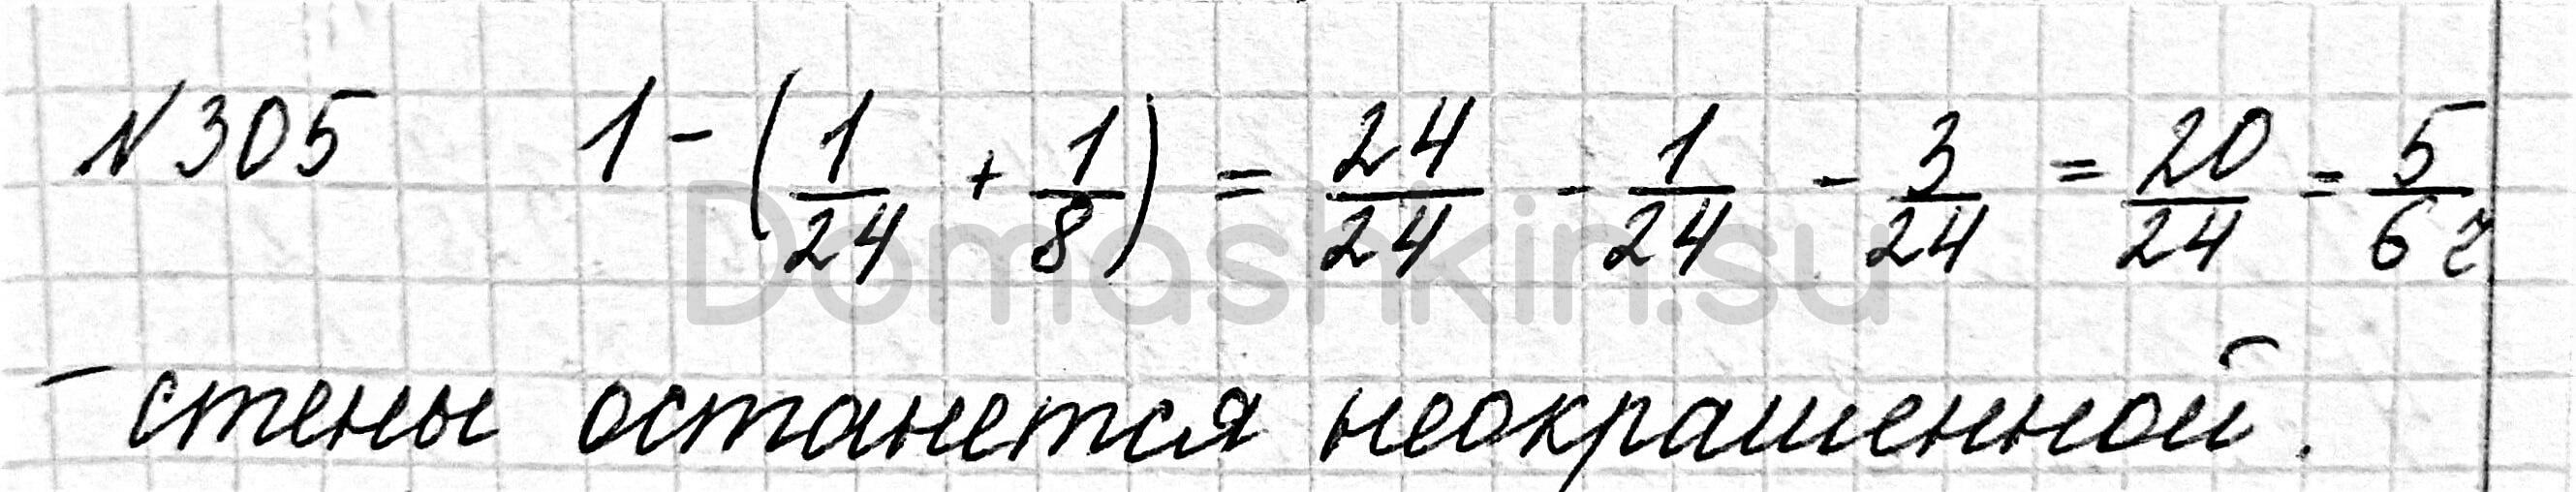 Математика 6 класс учебник Мерзляк номер 305 решение